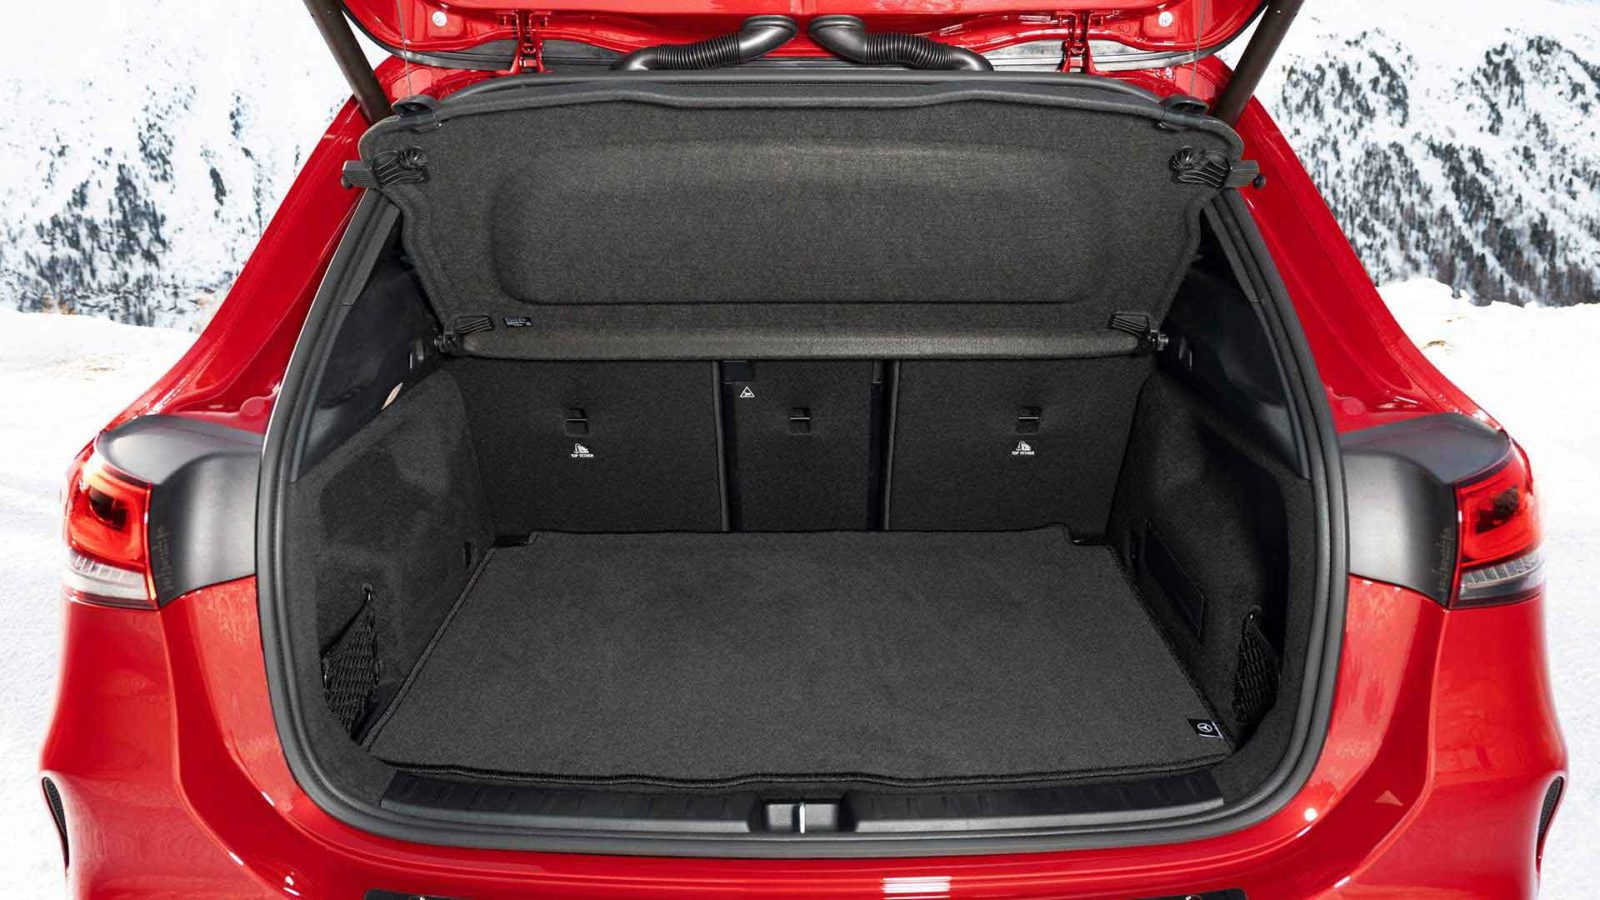 Mercedes GLA 2021 фото, технические характеристики, цена, багажник, багажное отделение